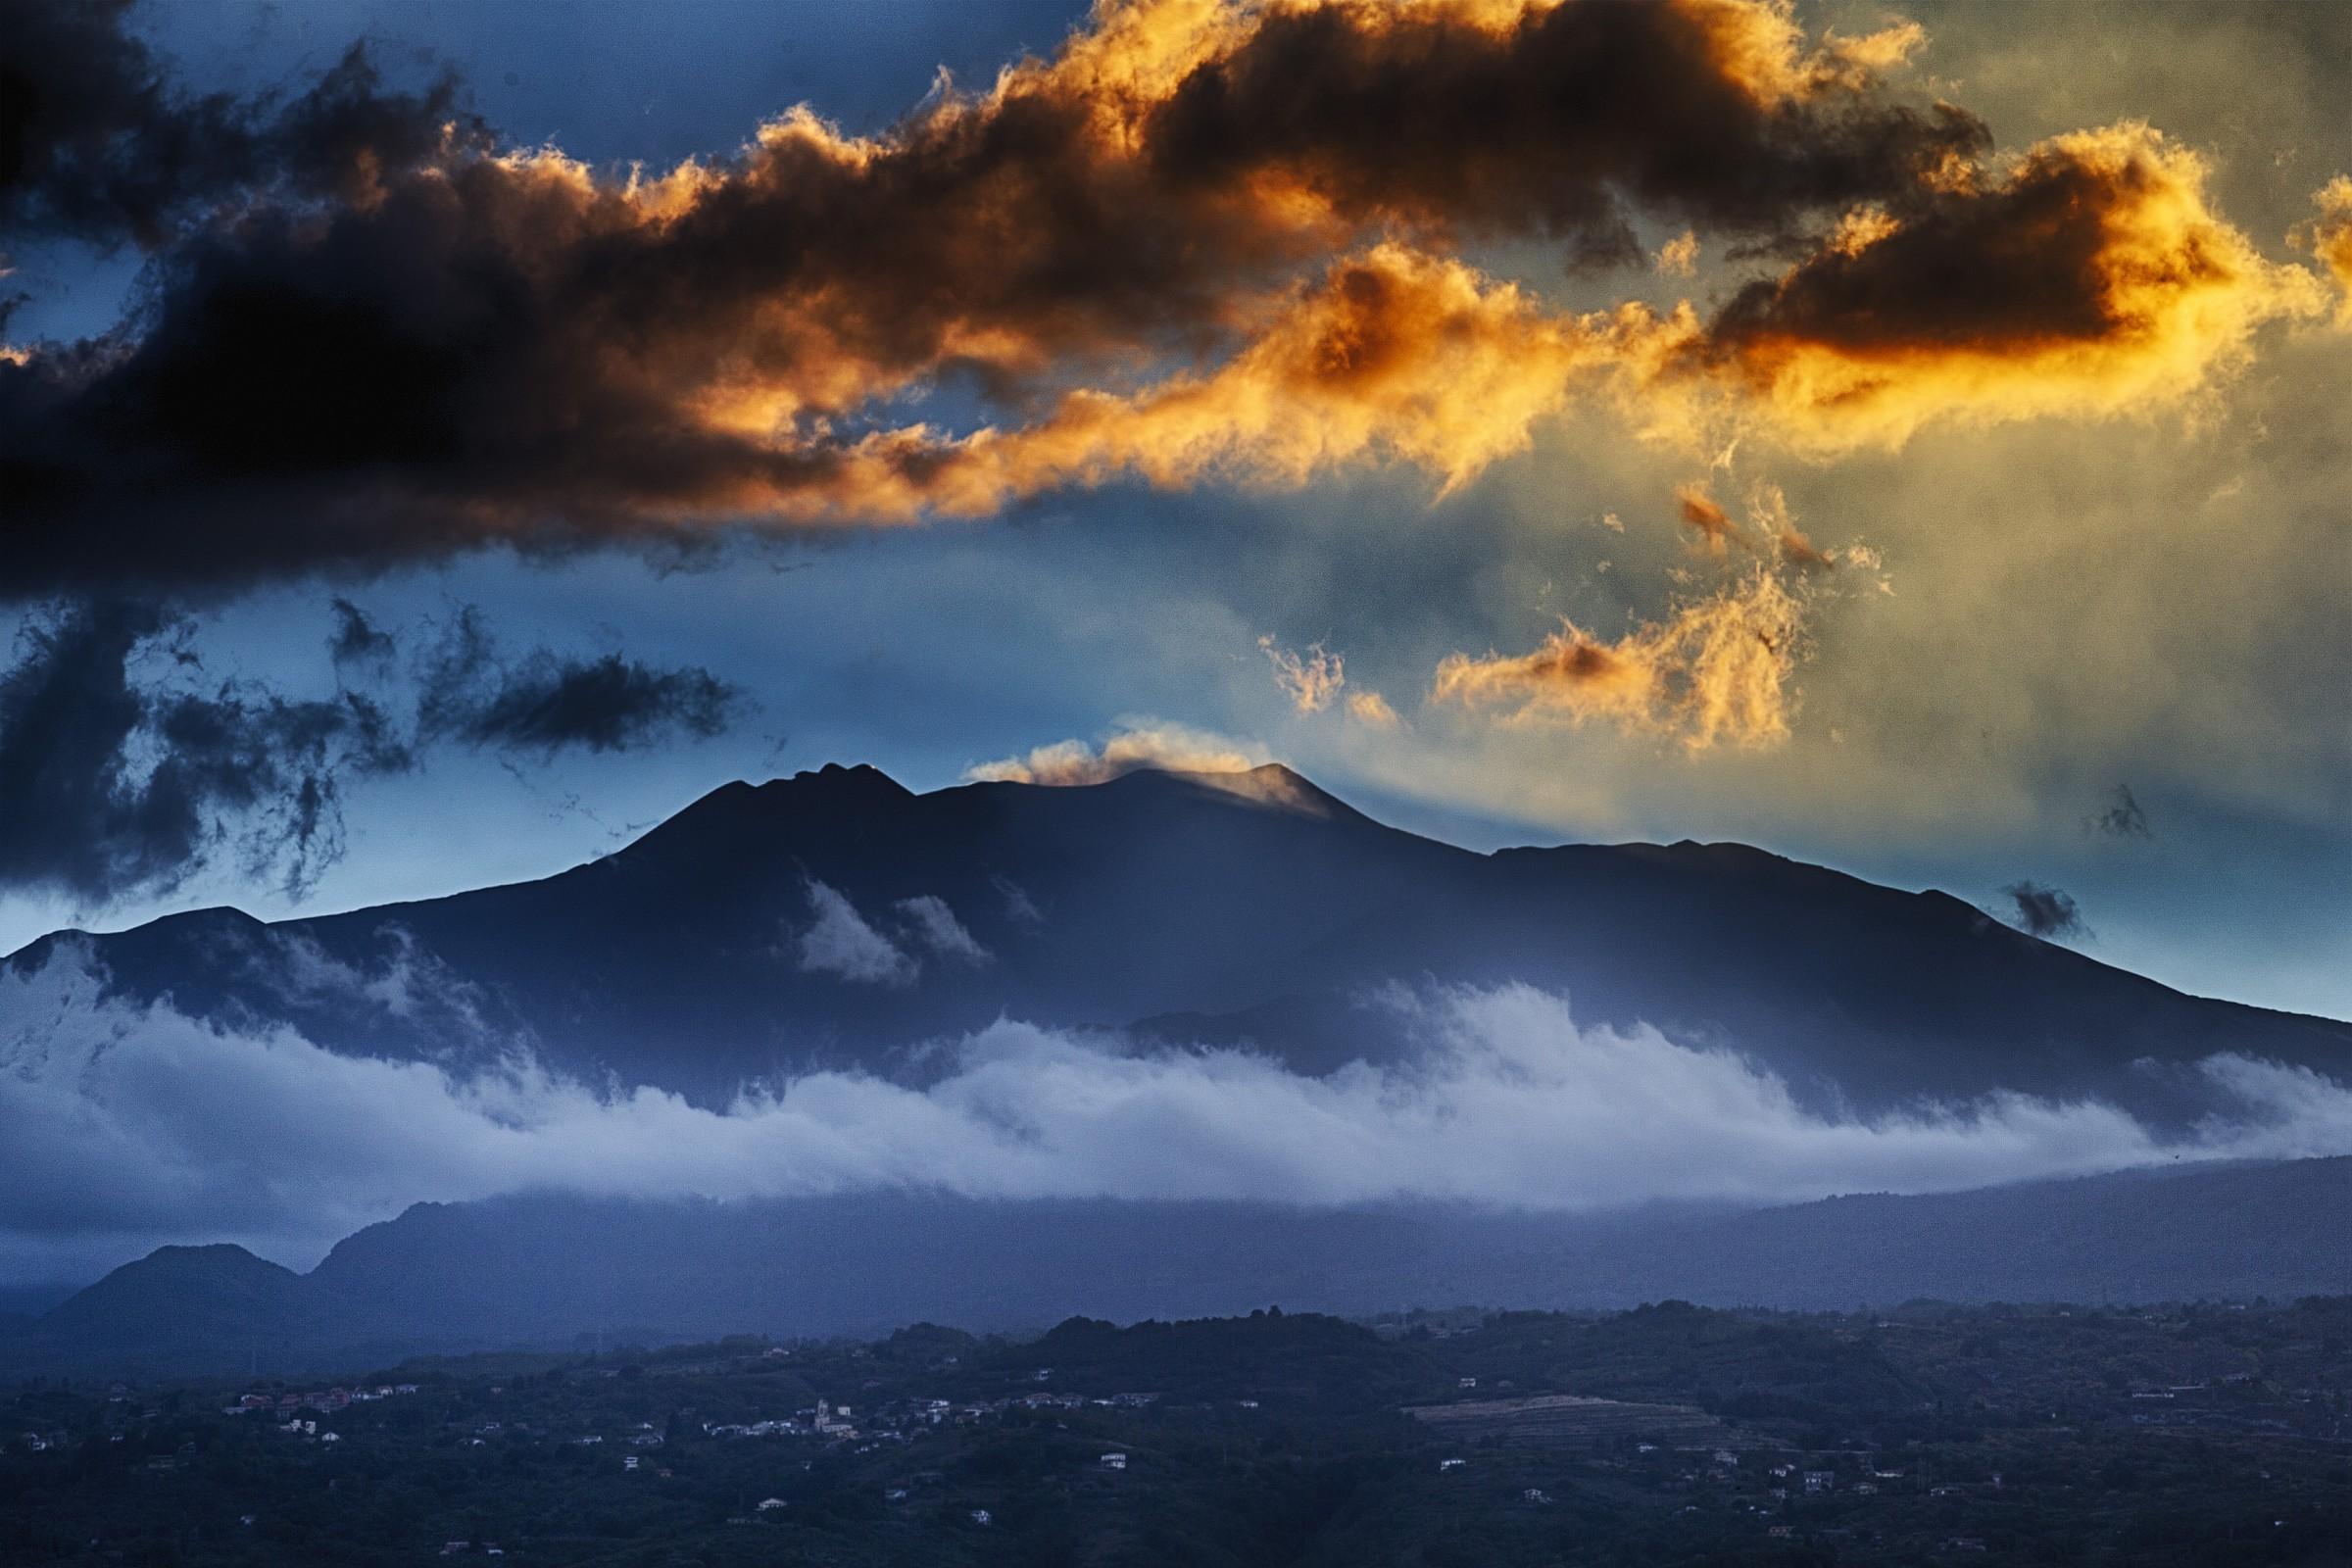 etna al tramonto da Fondachello (Mascali - CT)...